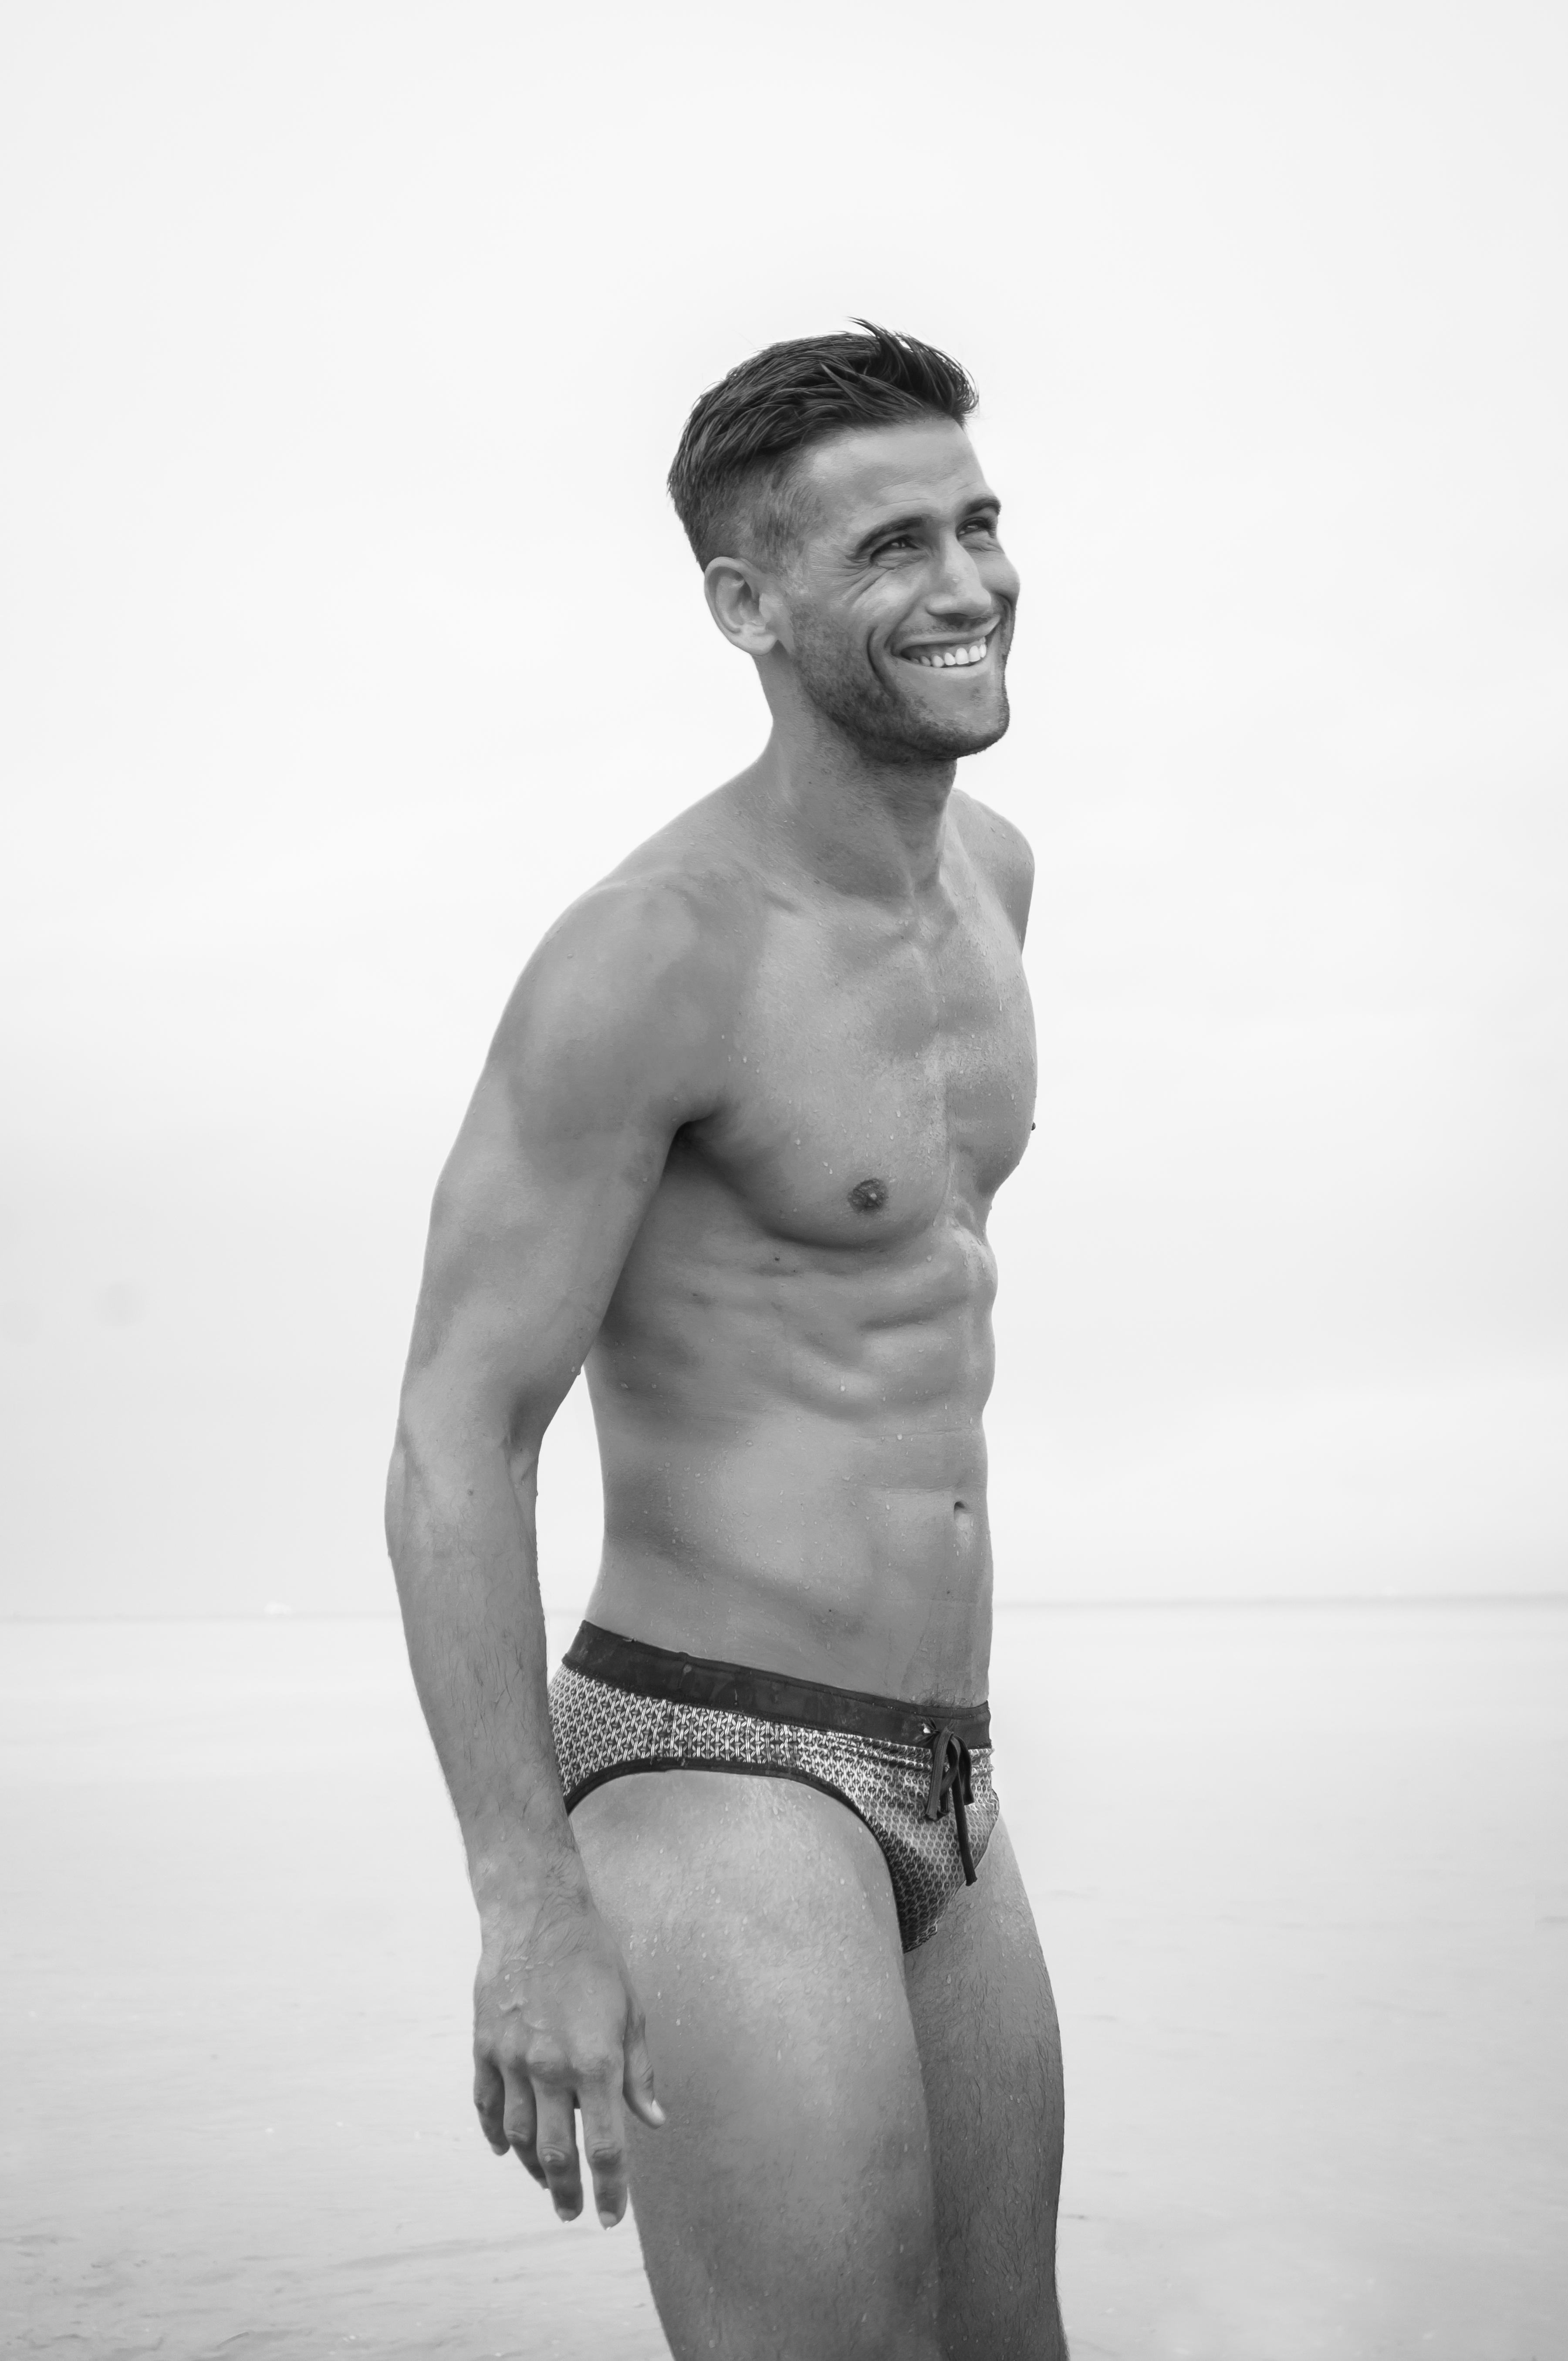 Nude black men modeling gay when fantastic 8